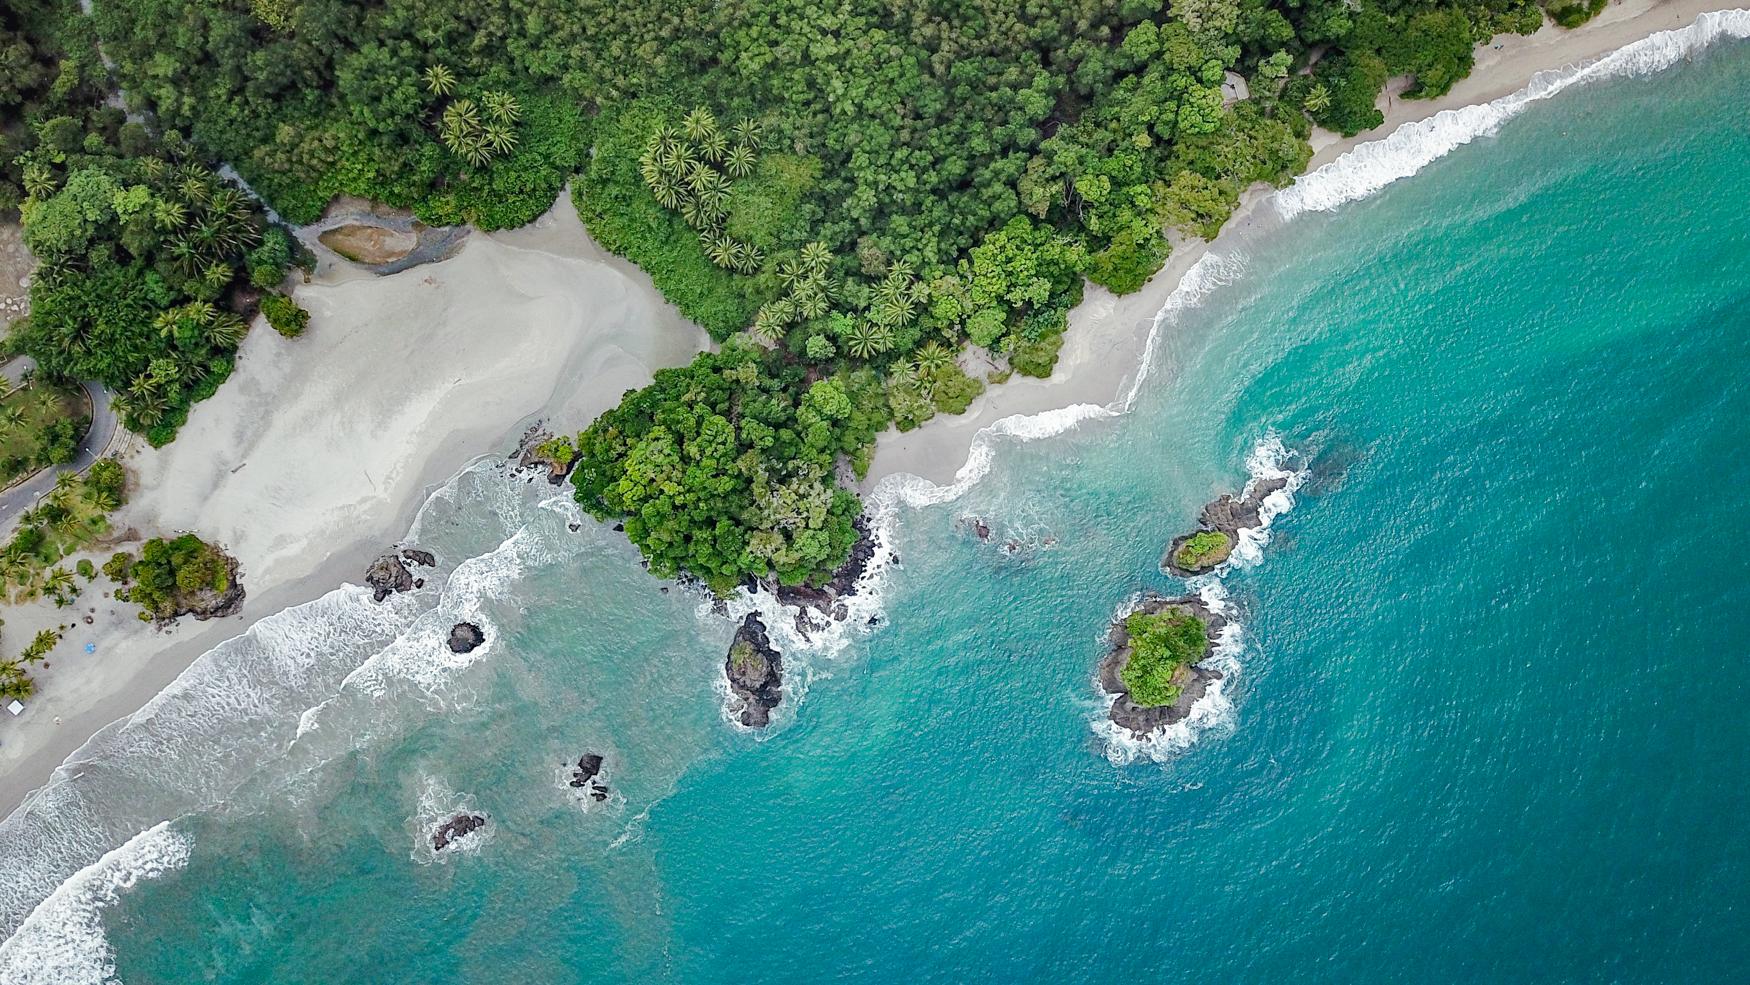 ManuelAntonio-Beach-YogaRetreat-Drone-Photography-Costa-Rica